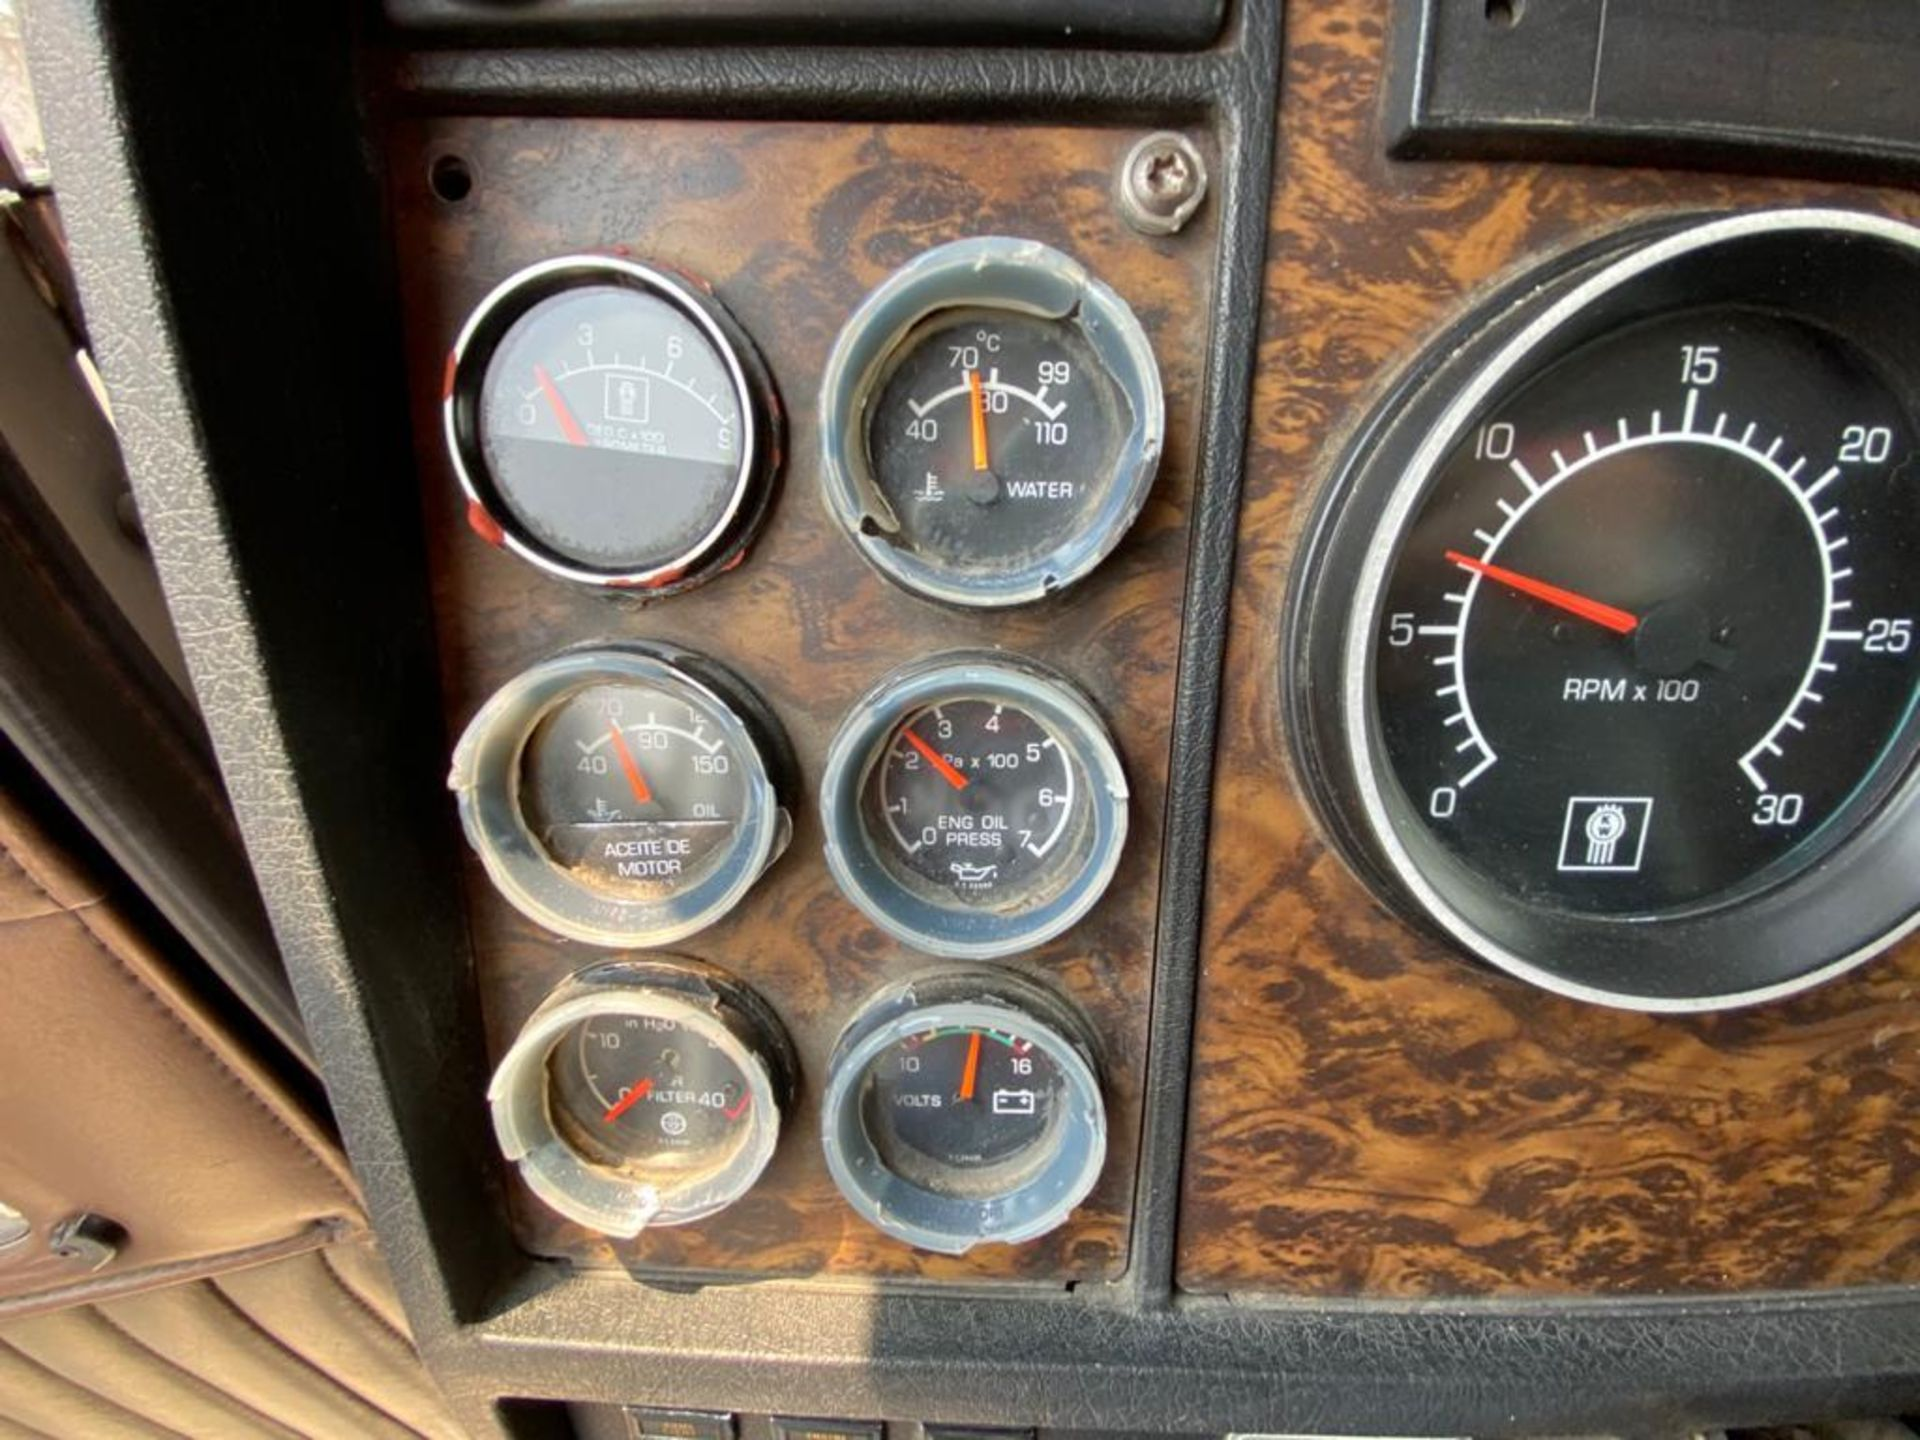 1999 Kenworth Sleeper truck tractor, standard transmission of 18 speeds - Image 40 of 70